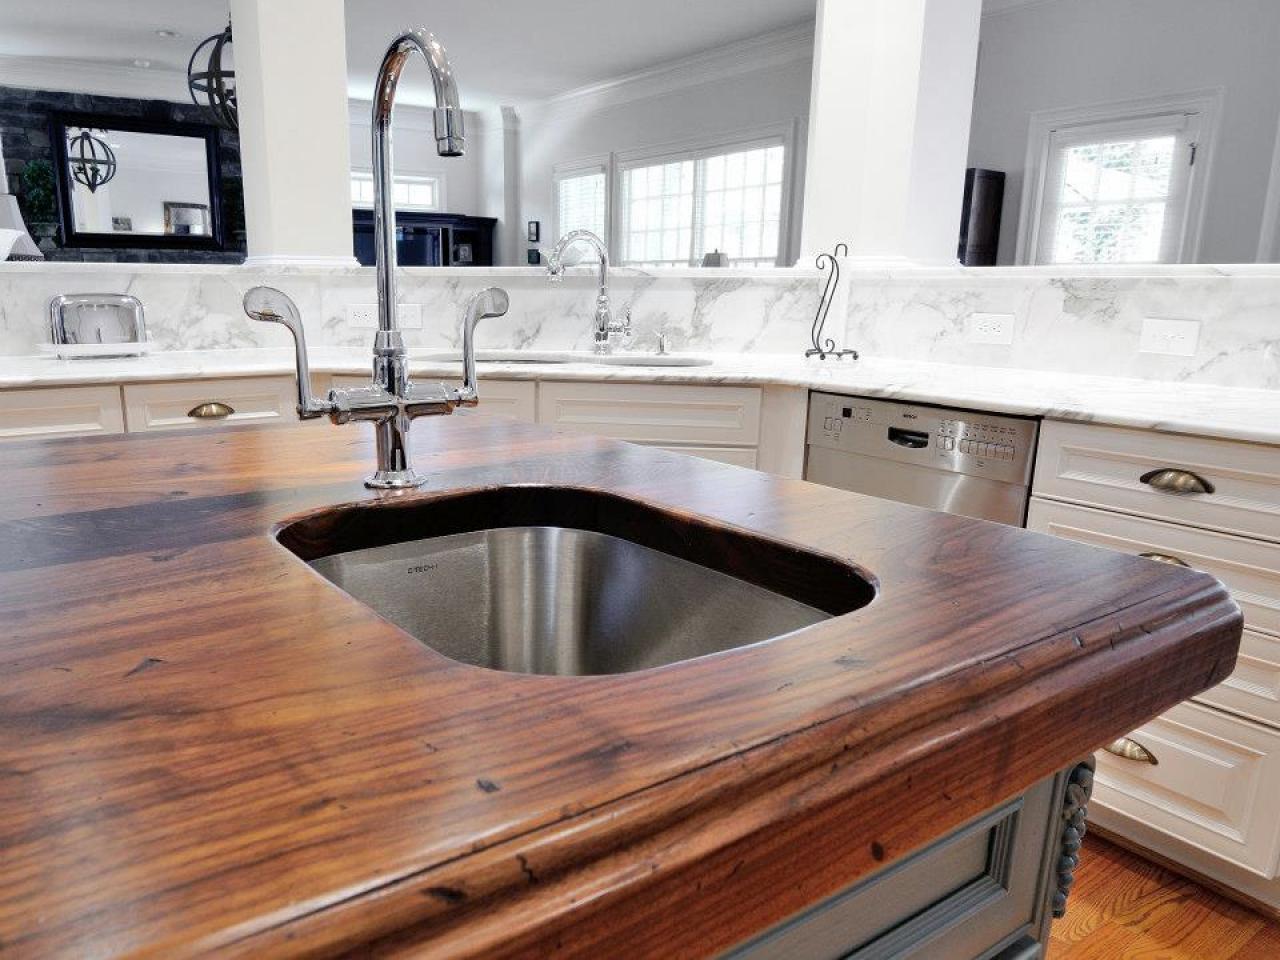 Uncategorized Kitchen Countertop Options kitchen countertop options pictures ideas from hgtv options